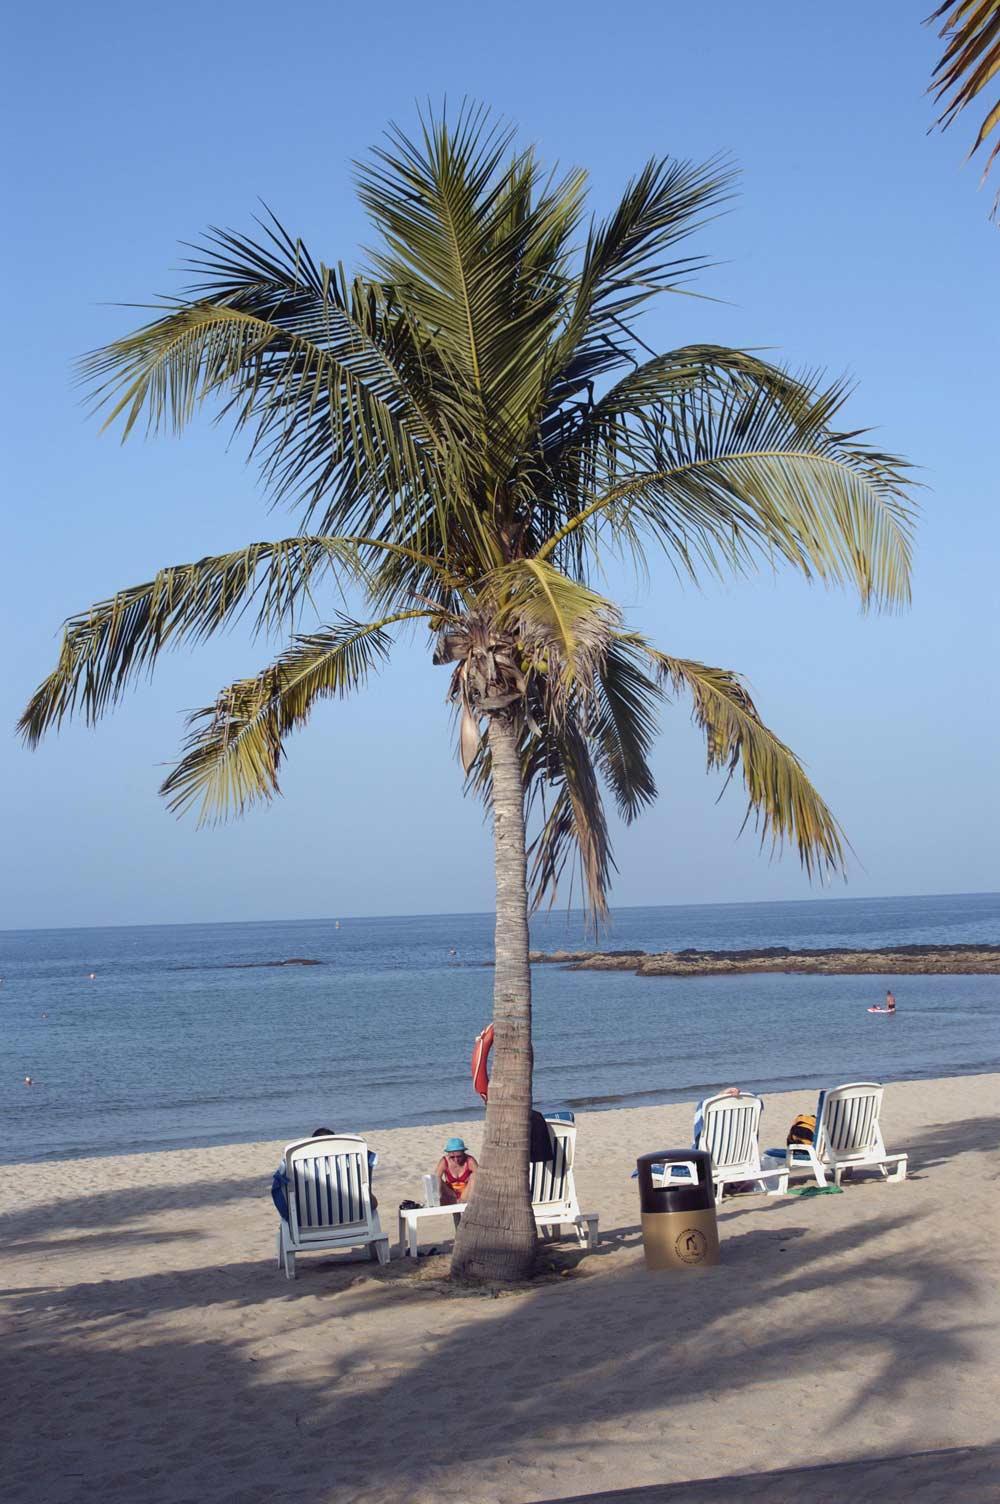 Oman - Qurum beach